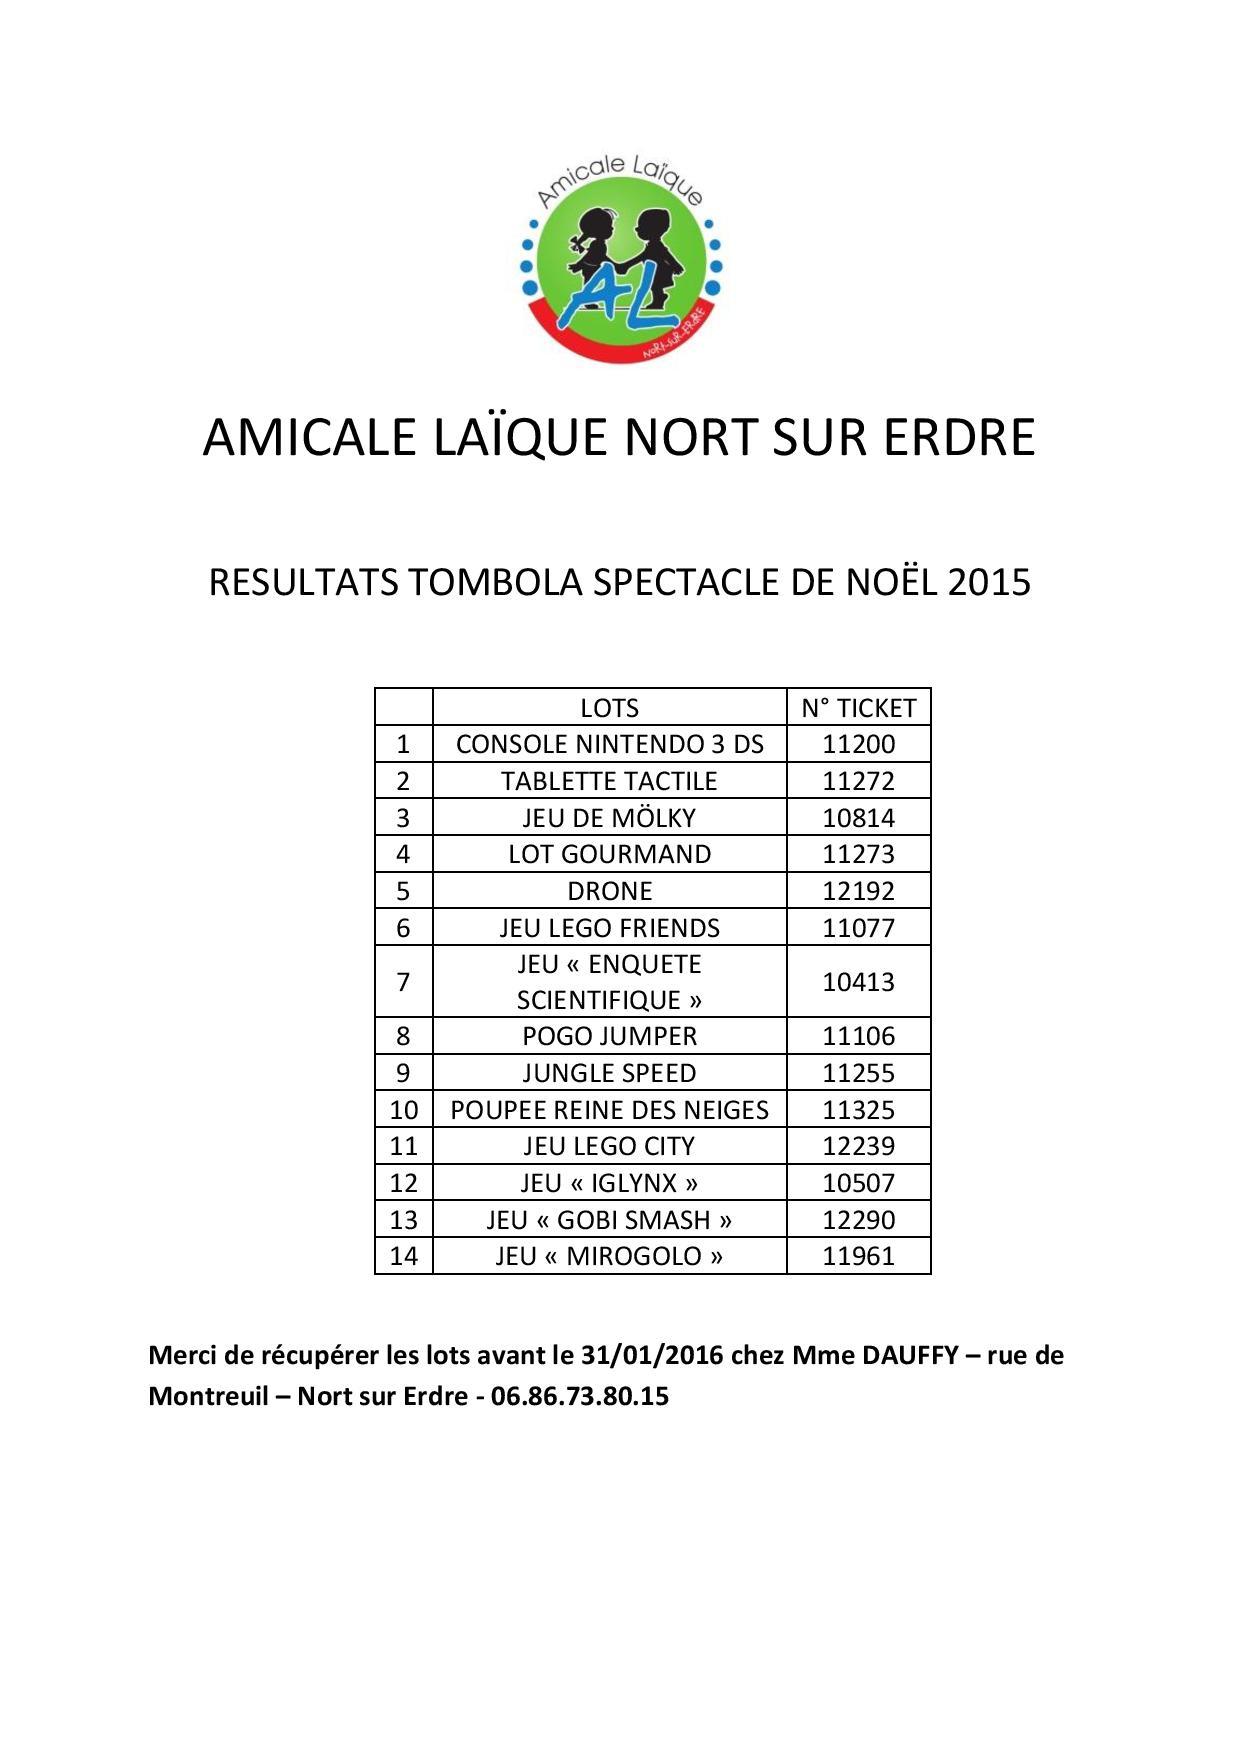 RESULTATS TOMBOLA NOËL 2015